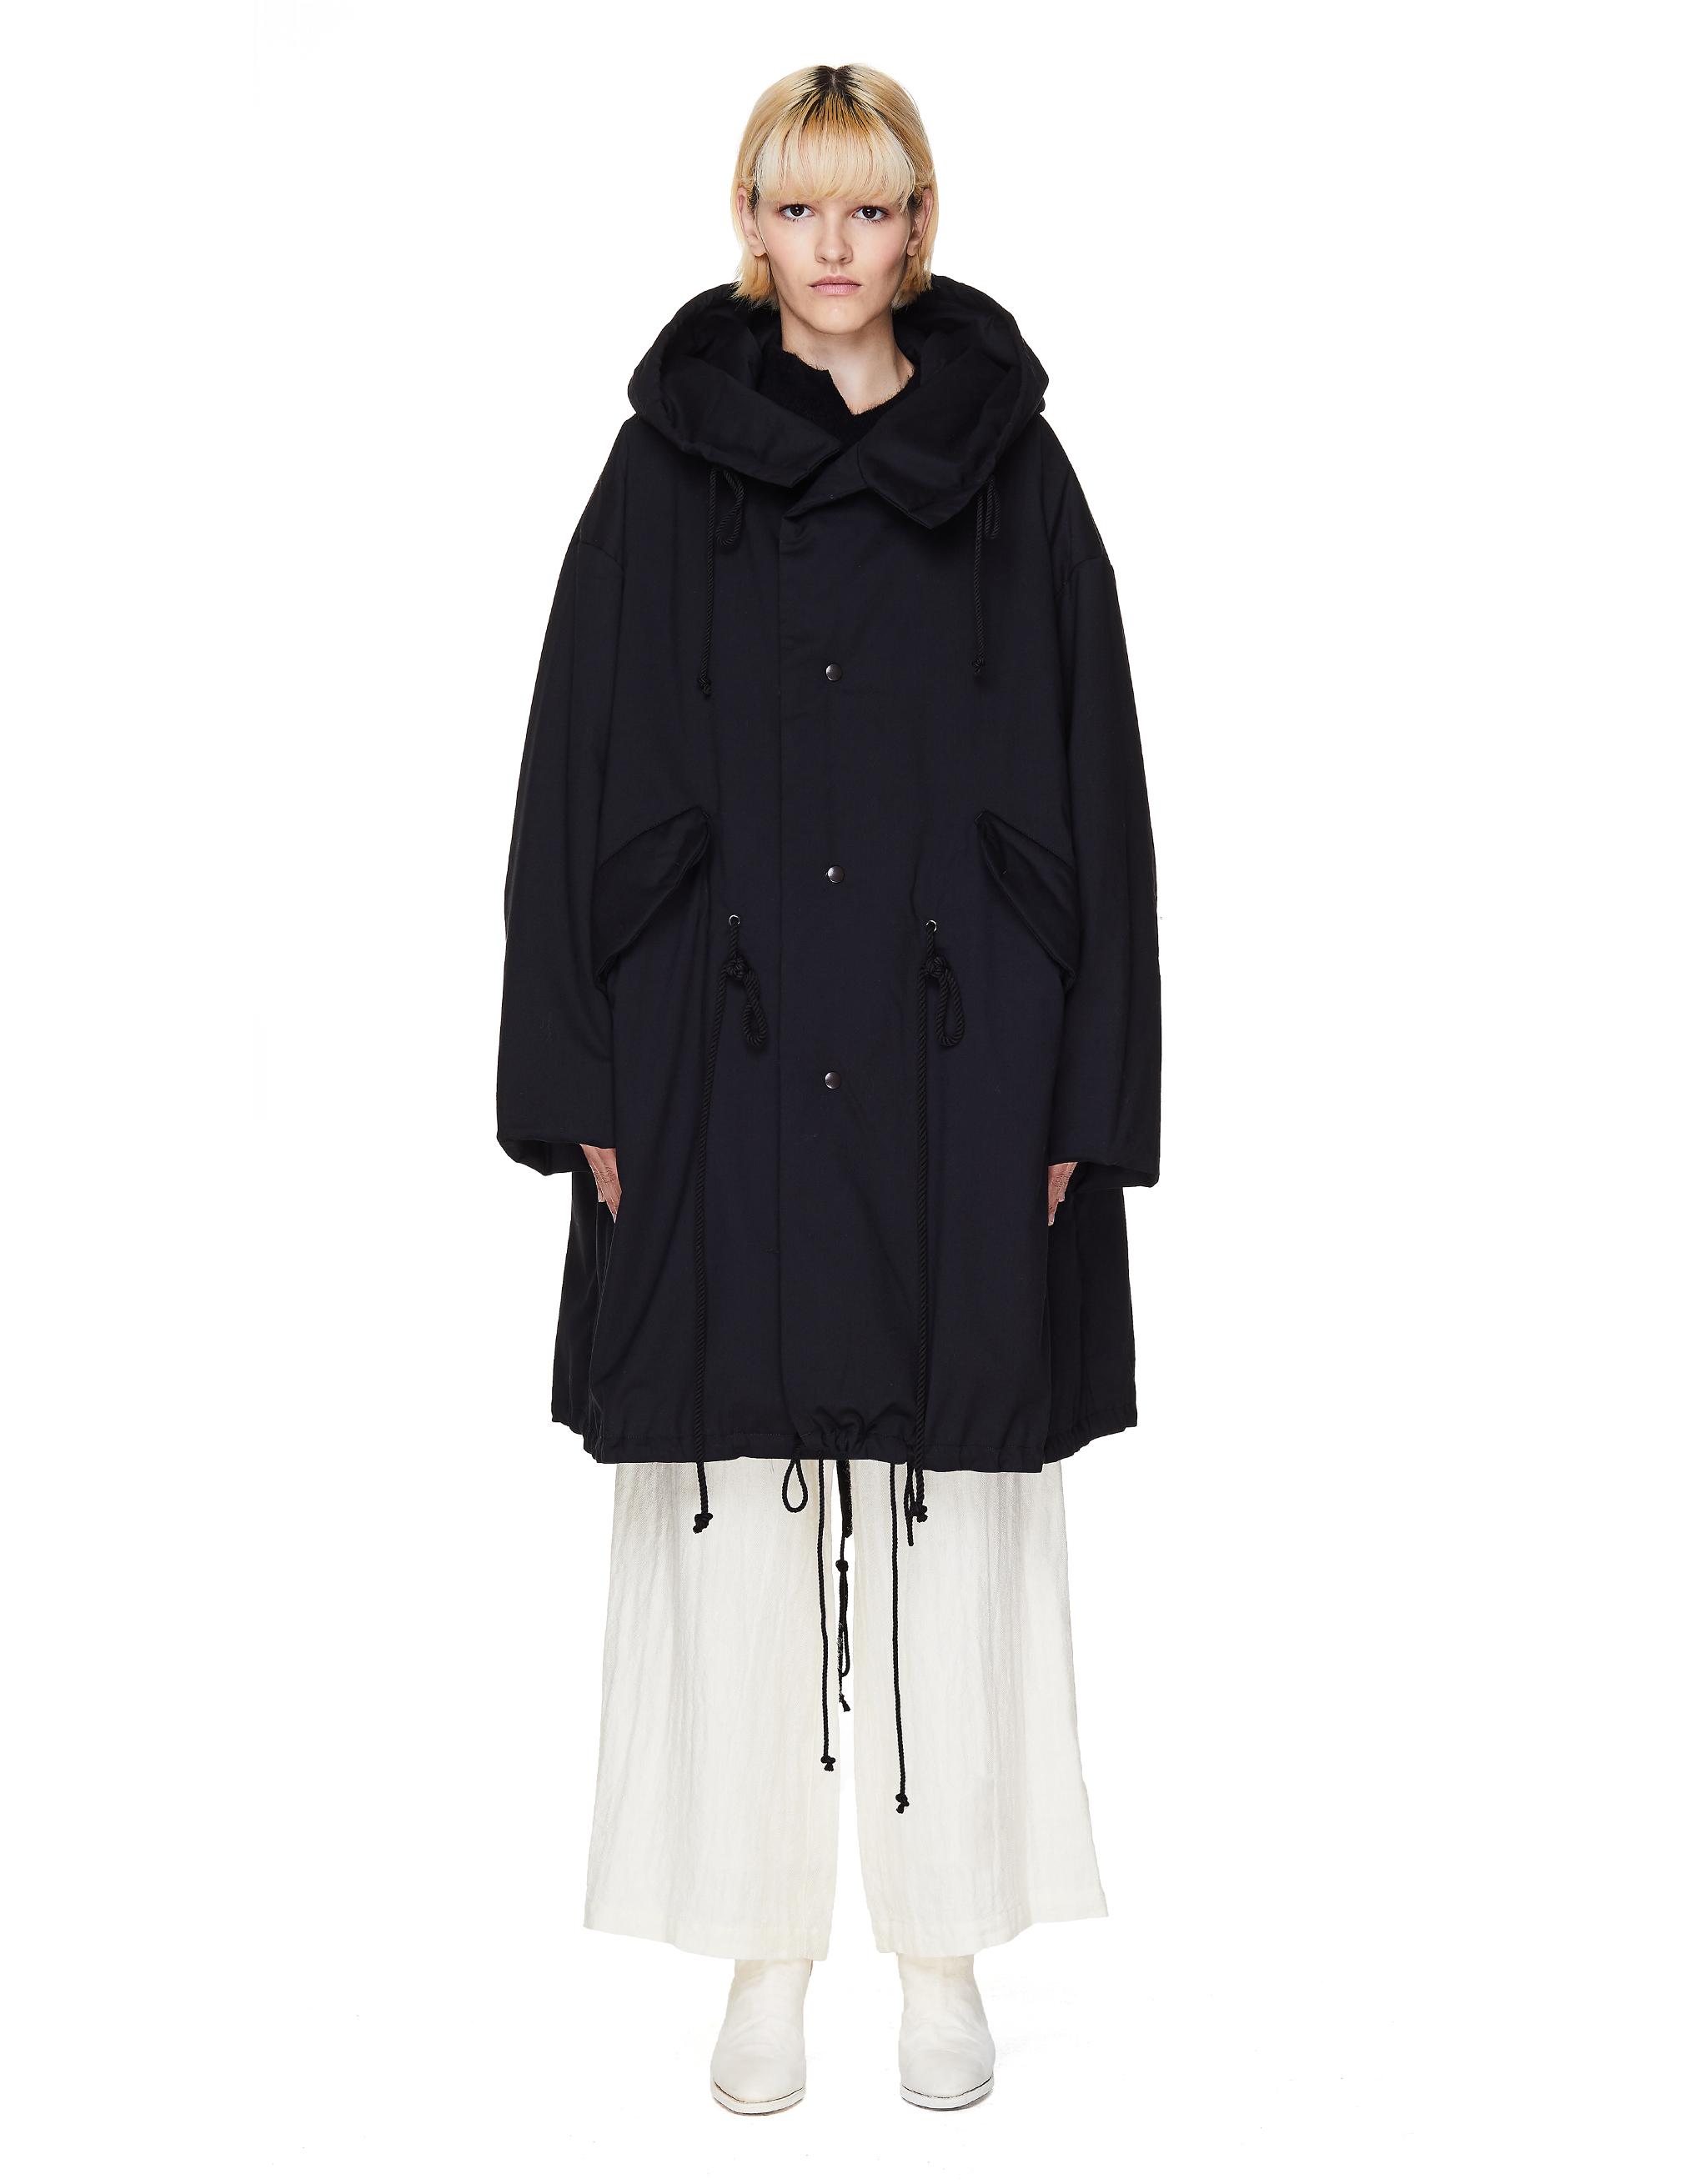 Ys Black Padded Parka Coat